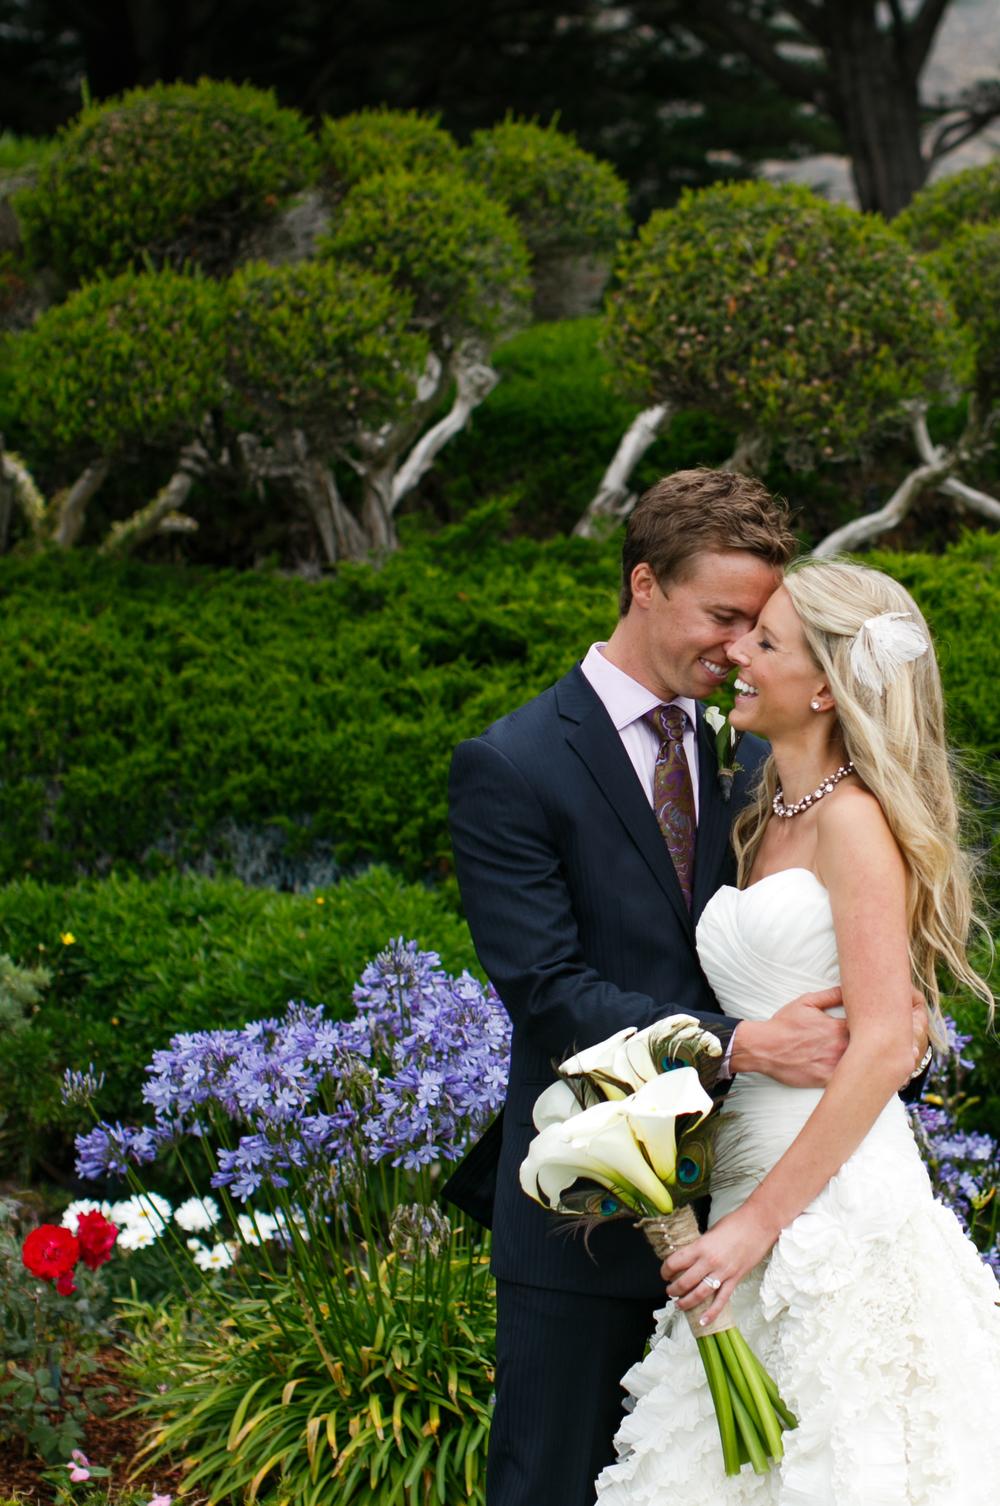 NYC-Wedding-Planner-Andrea-Freeman-Events-Malibu-Private-Estate-1.jpg